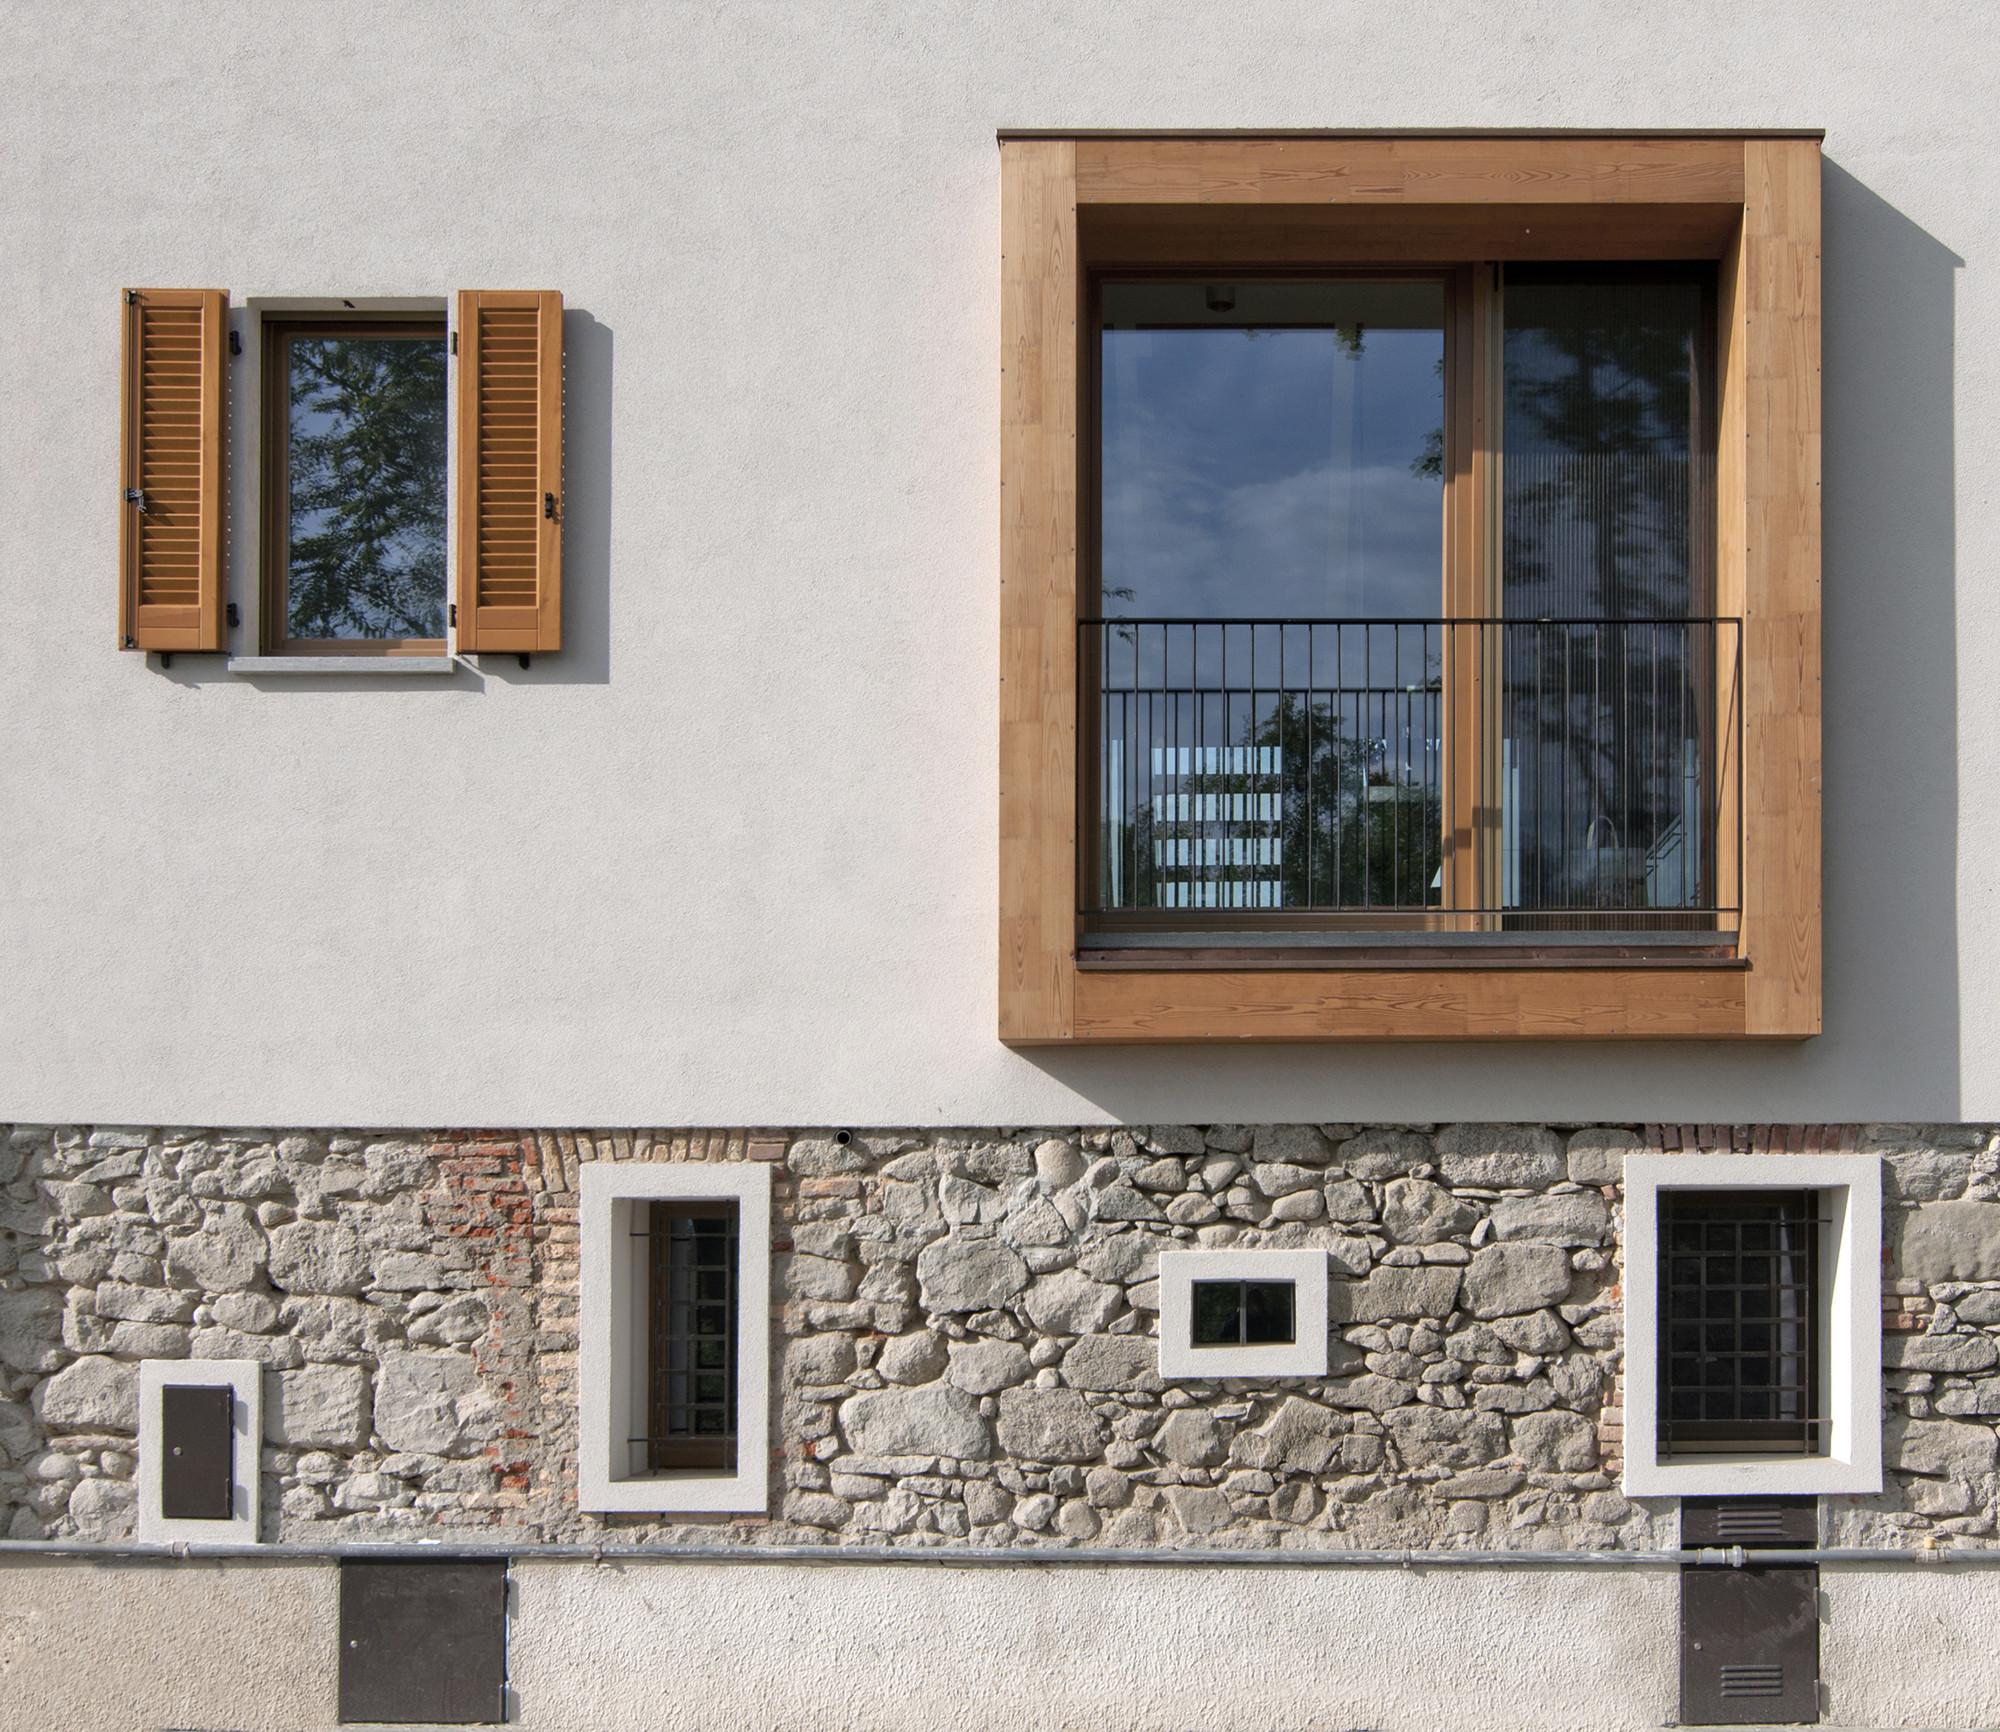 Reforma de um velho celeiro arcoquattro architettura for Case con facciate in pietra